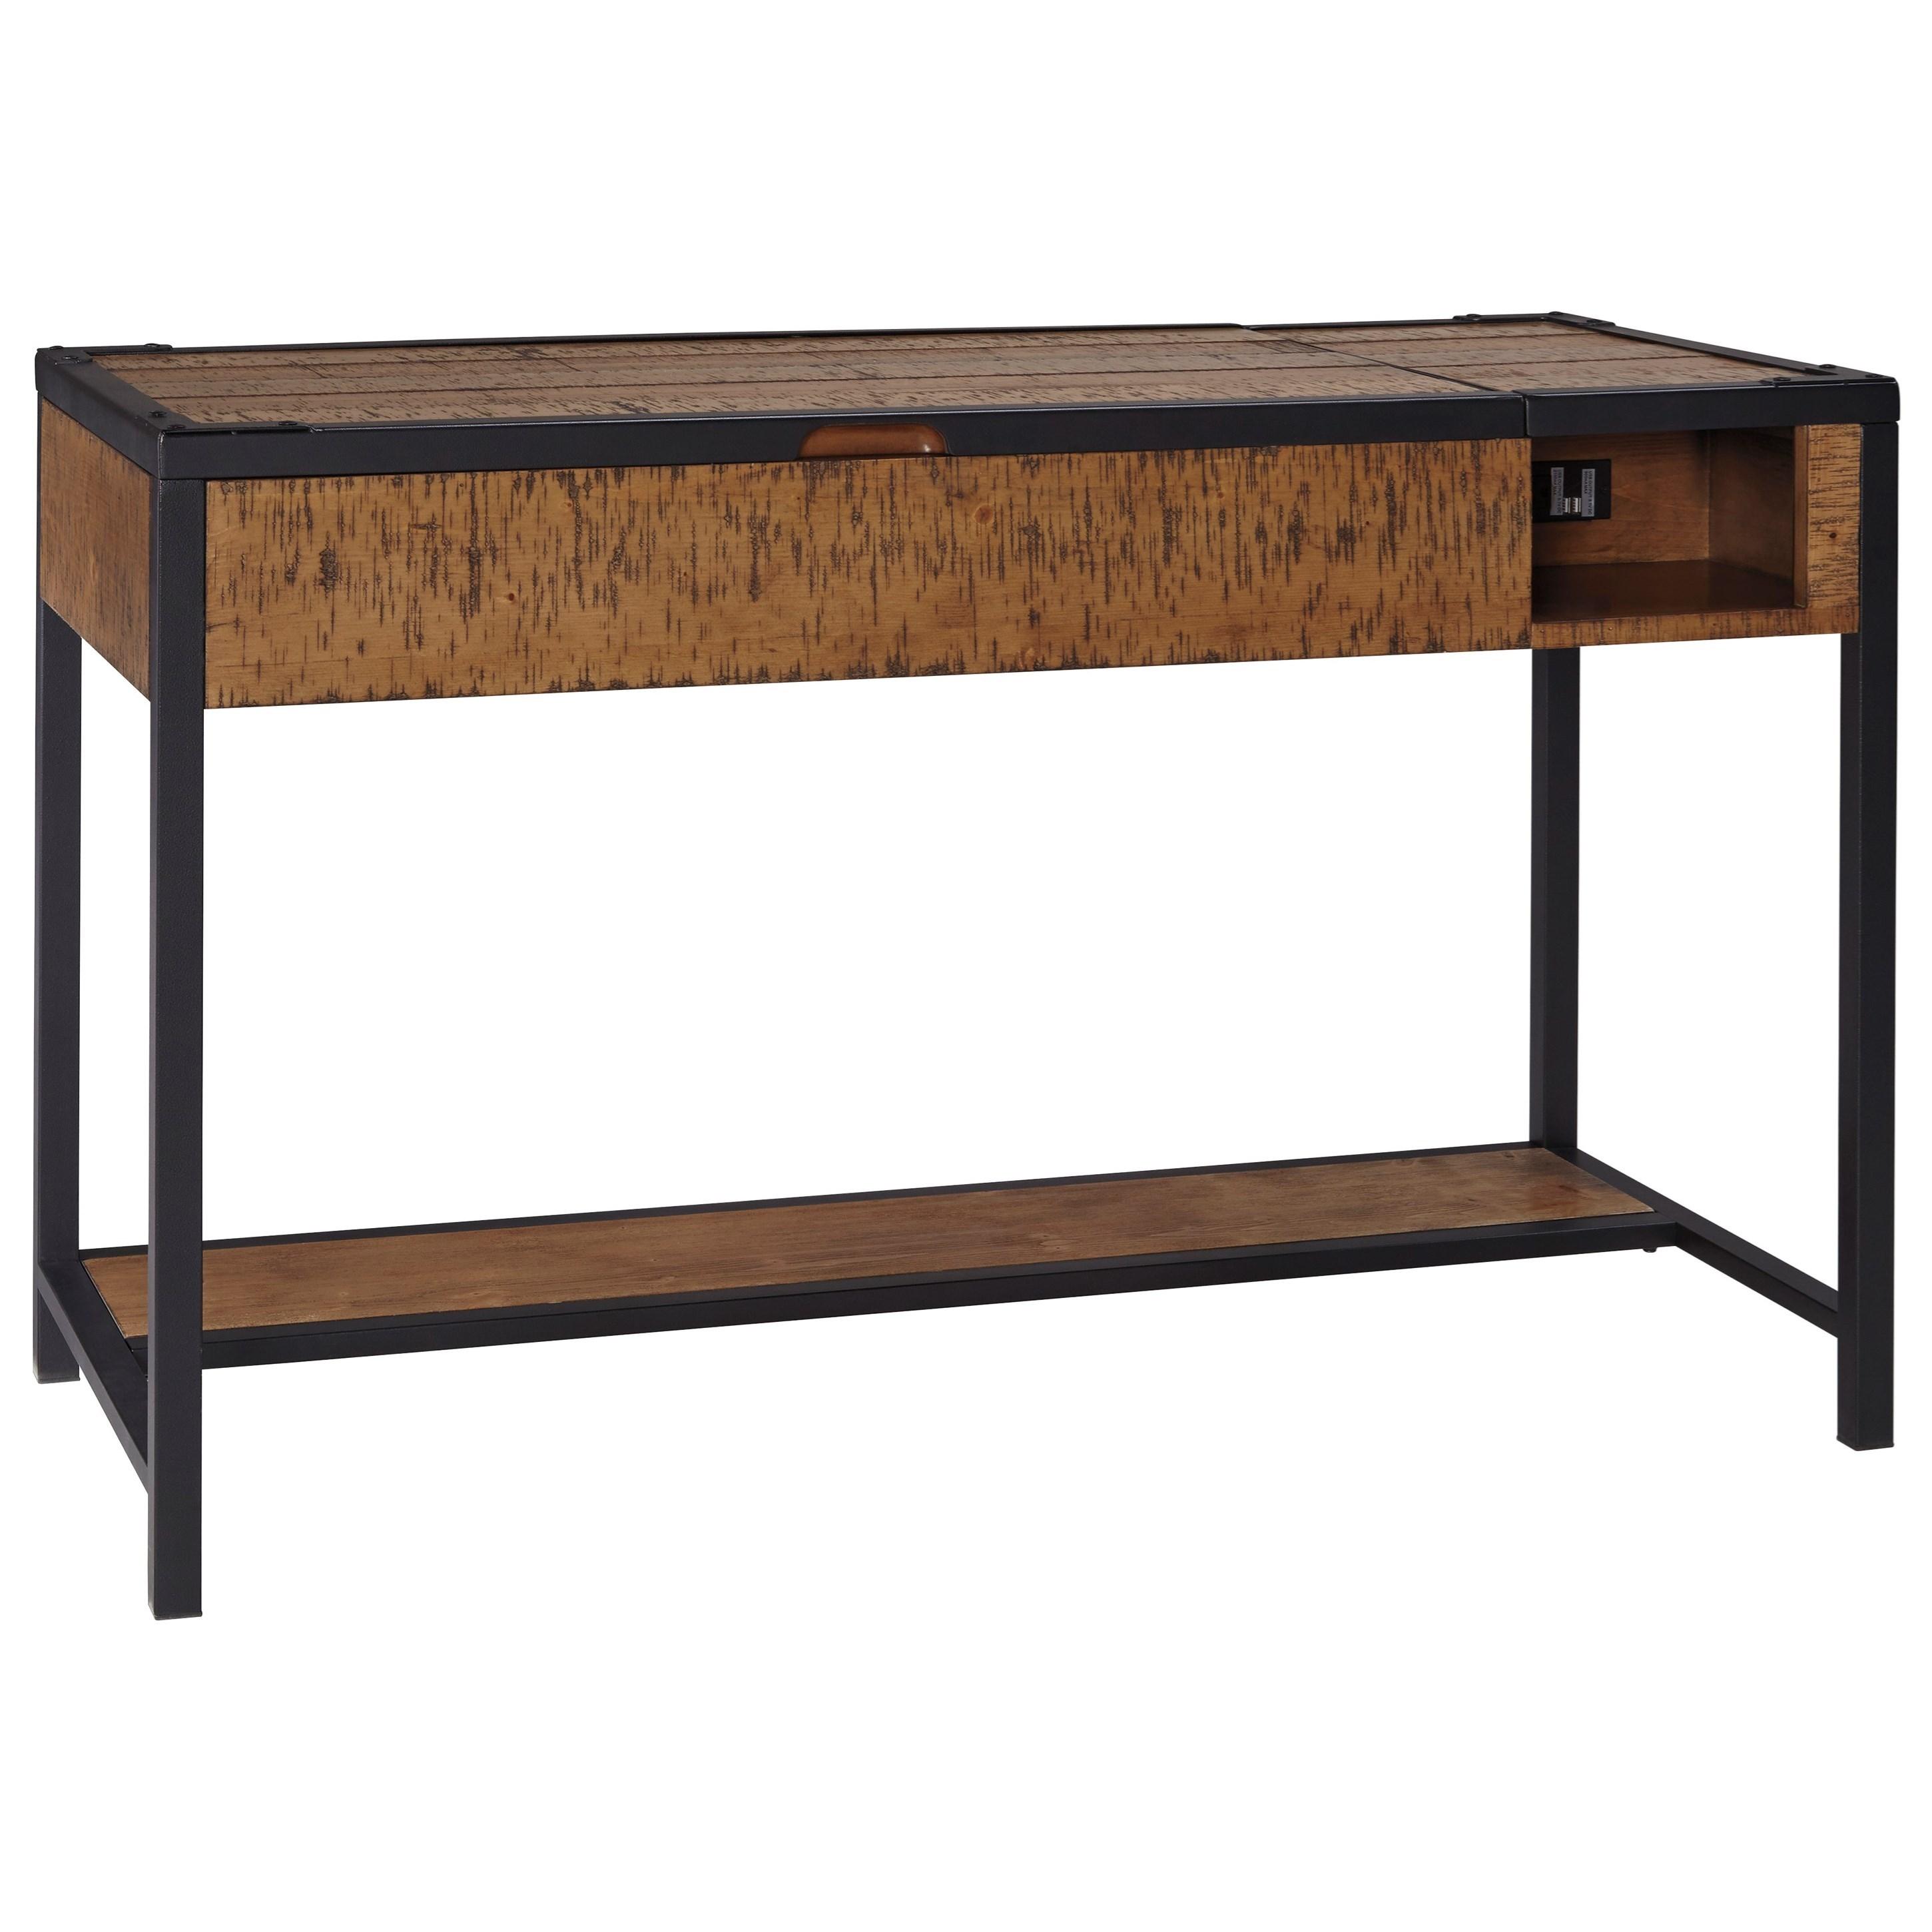 Signature Design by Ashley Kalean Home Office Lift Top Desk - Item Number: H817-29